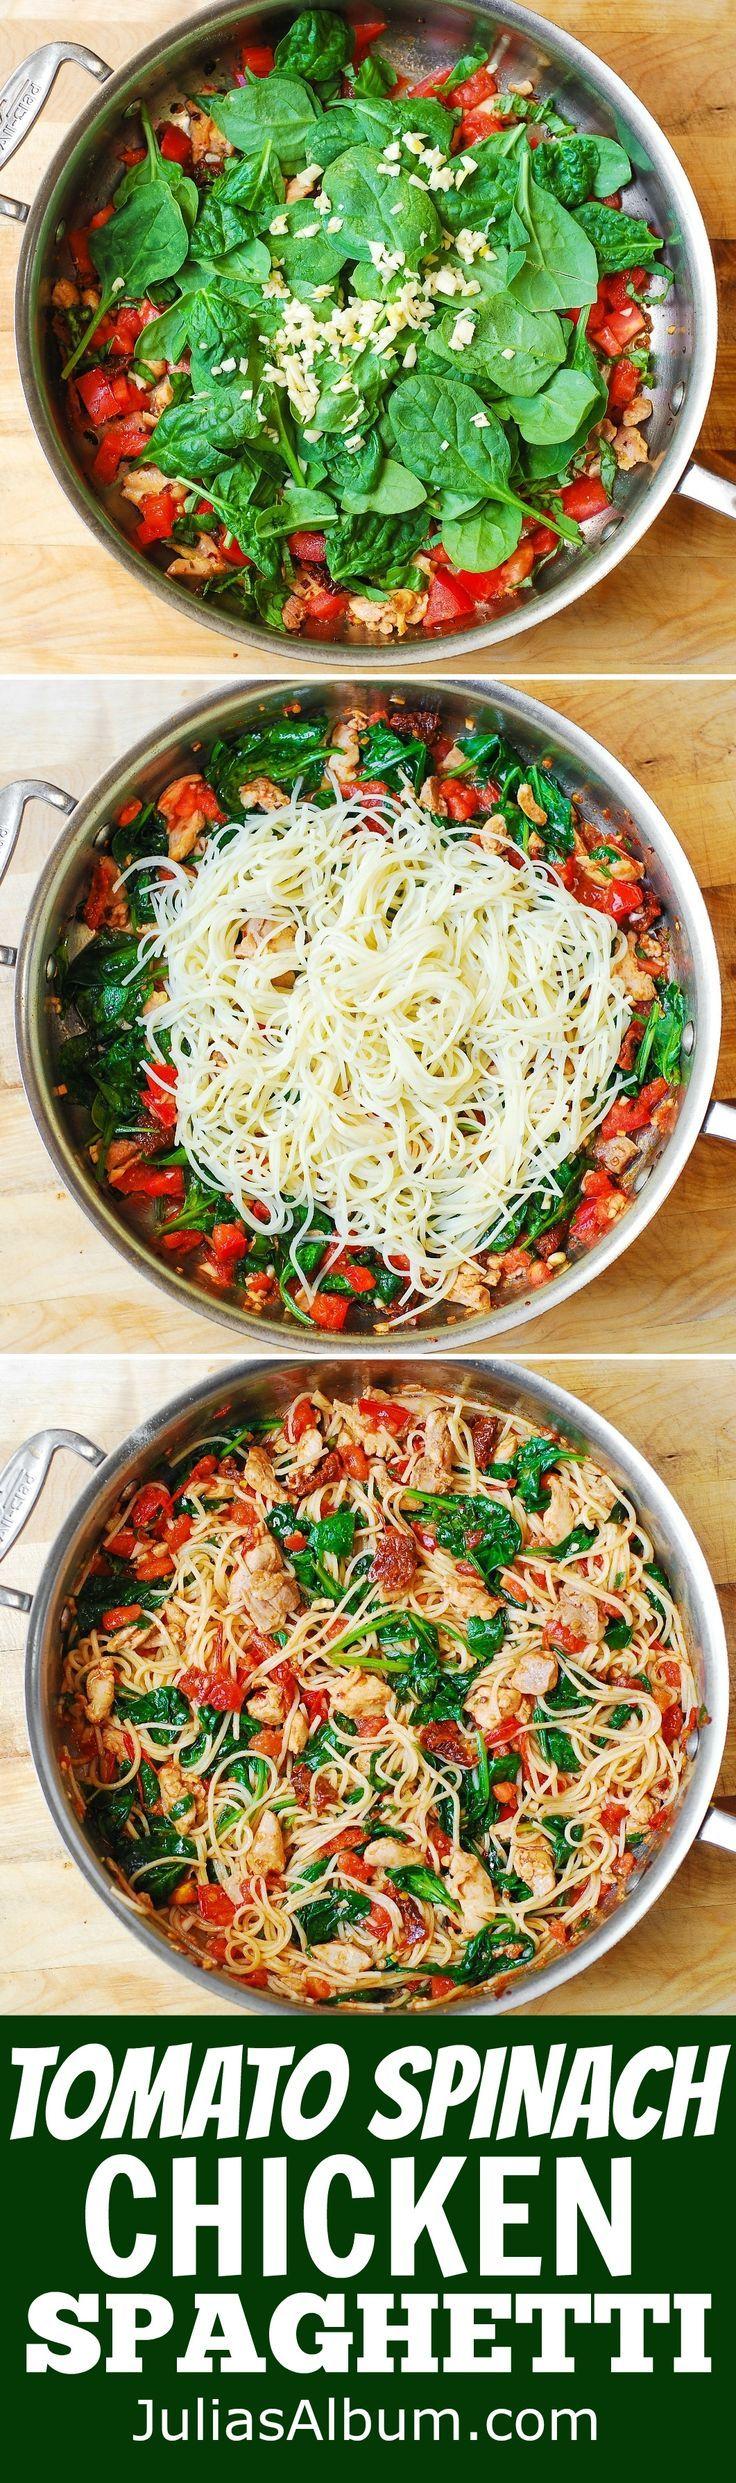 Tomato Basil Spinach Chicken Spaghetti Healthy Light